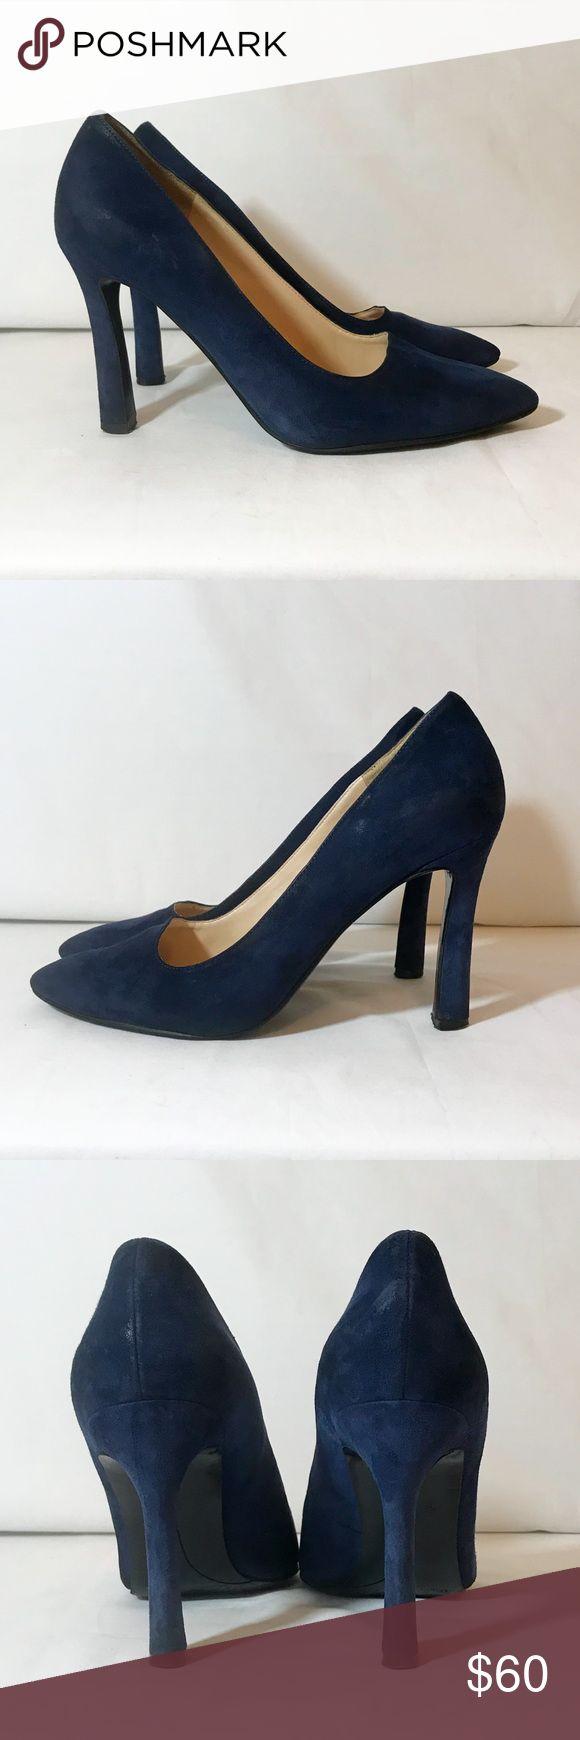 "EUC Nine West Navy Blue Suede pumps size 8.5 EUC Nine West Navy Blue Suede pumps size 8.5. Heel is 4"". Beautiful shoes and look gorgeous on! Shoes Heels"